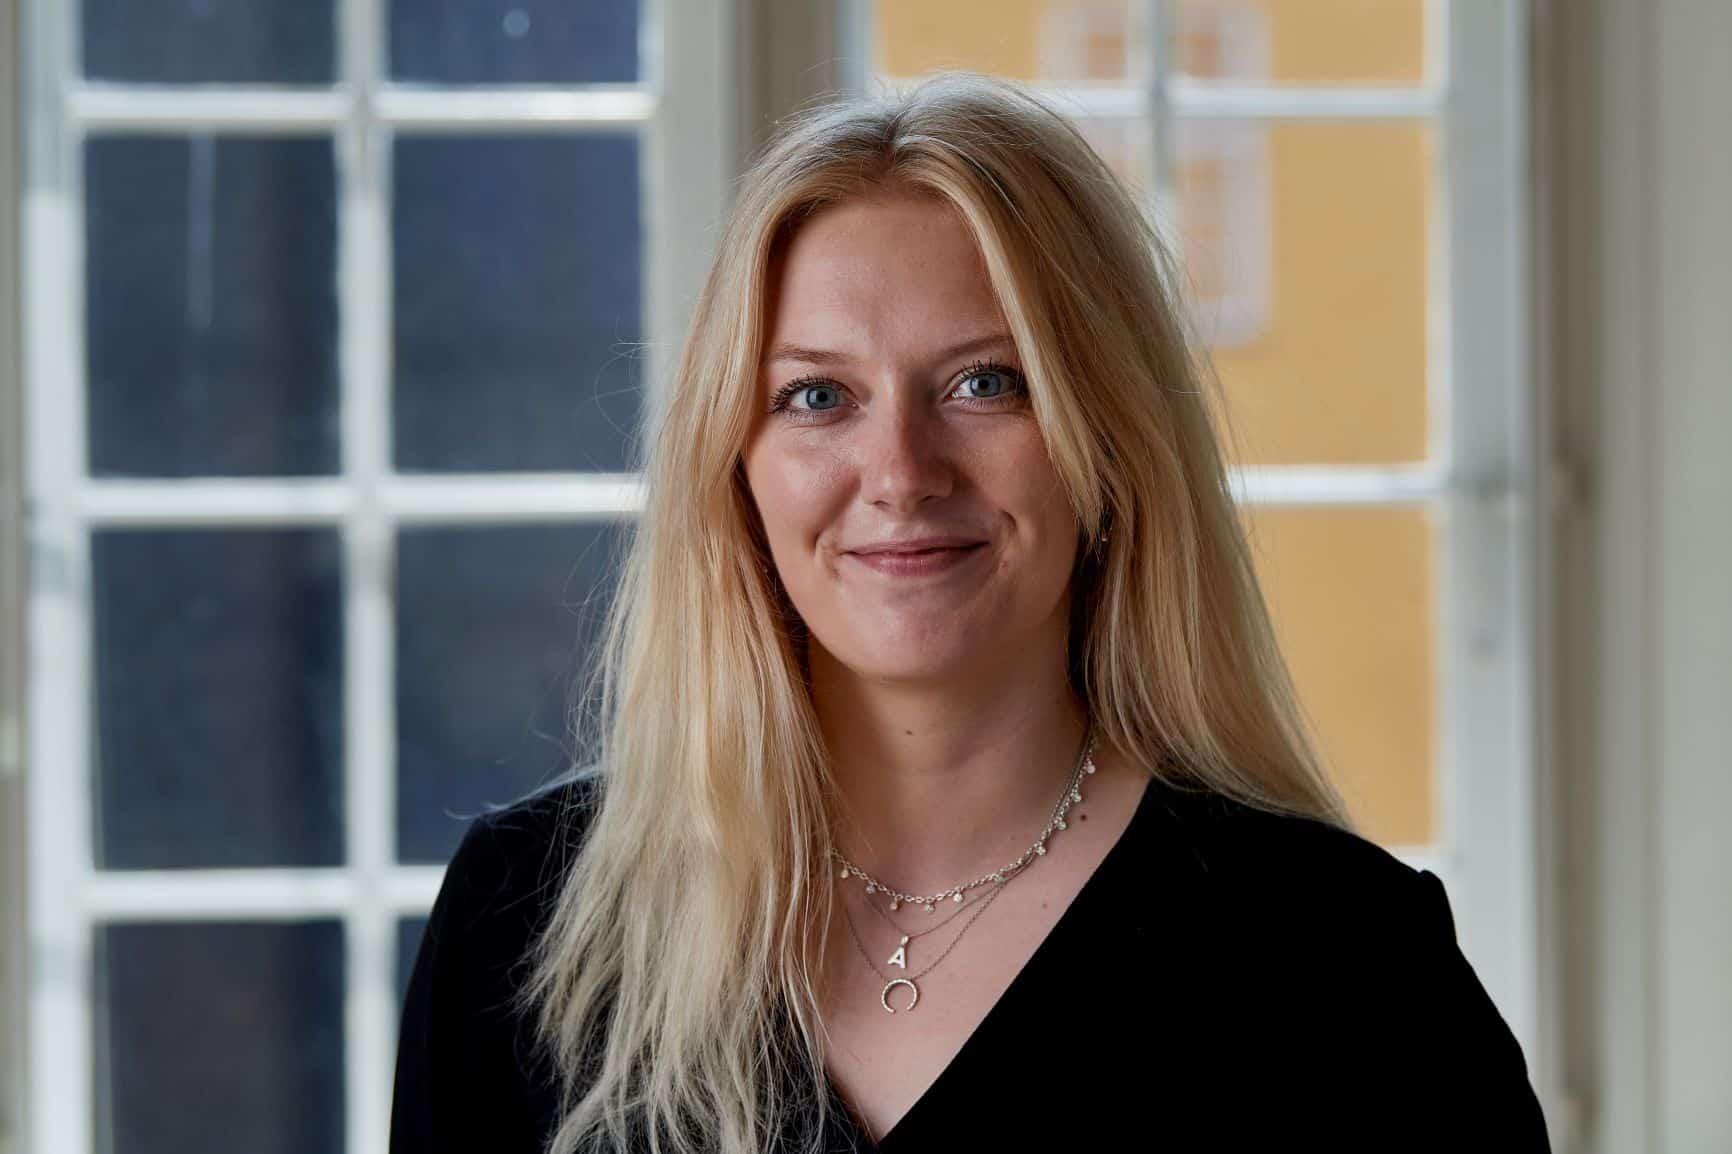 Amalie Ayoe Sørensen